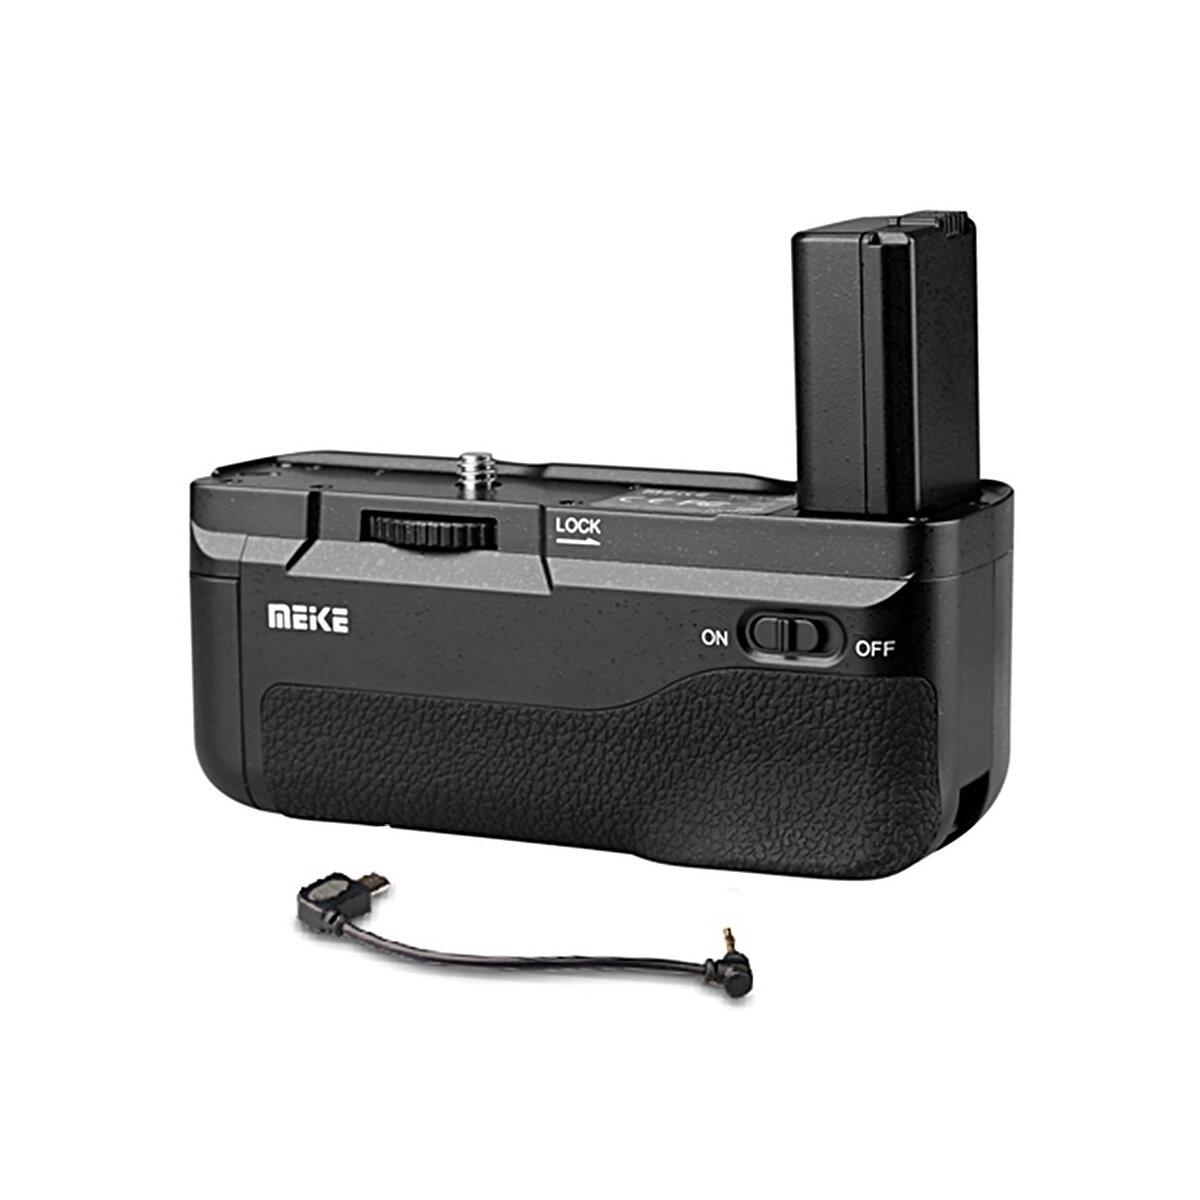 Meike Batteriegriff fuer Sony A6300 - 100% kompatibel & passgenaue Form